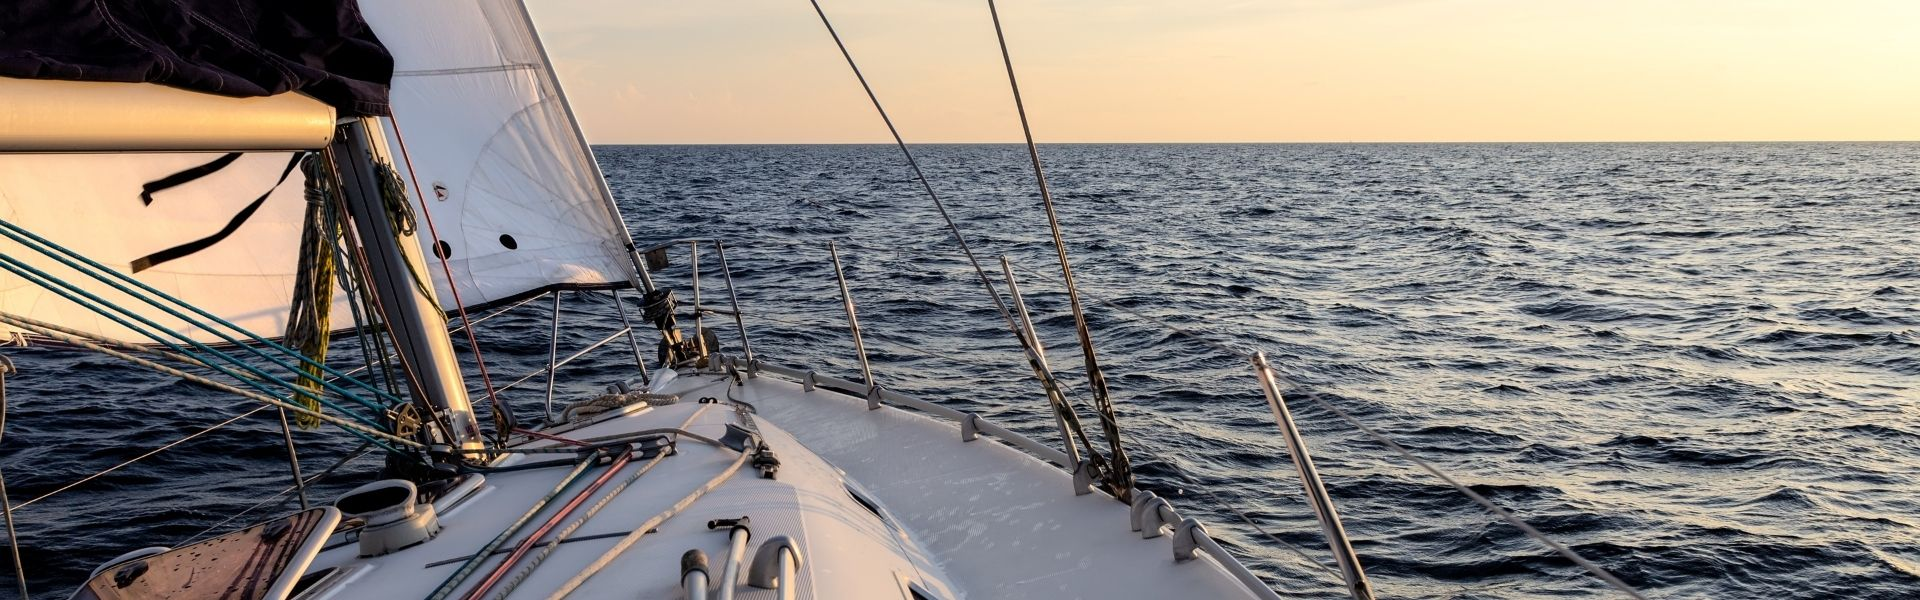 Аренда яхты «Sesila» в Херсоне